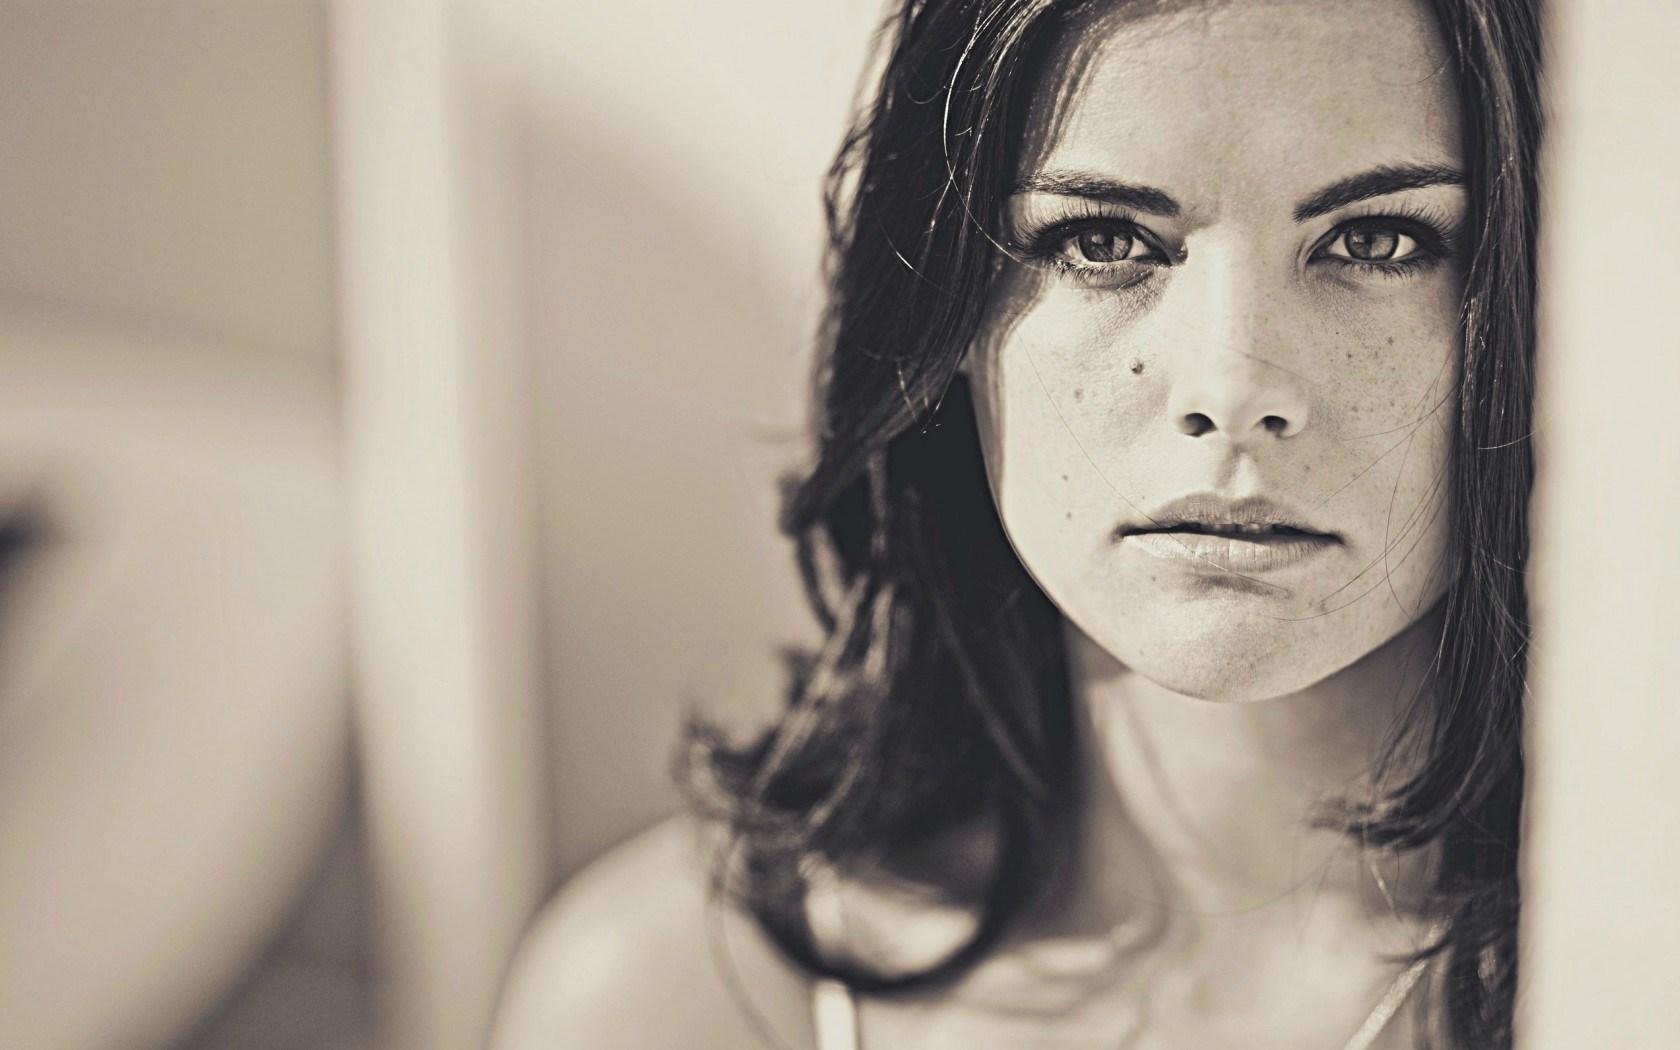 Jaimie Alexander Lovely Girl Actress